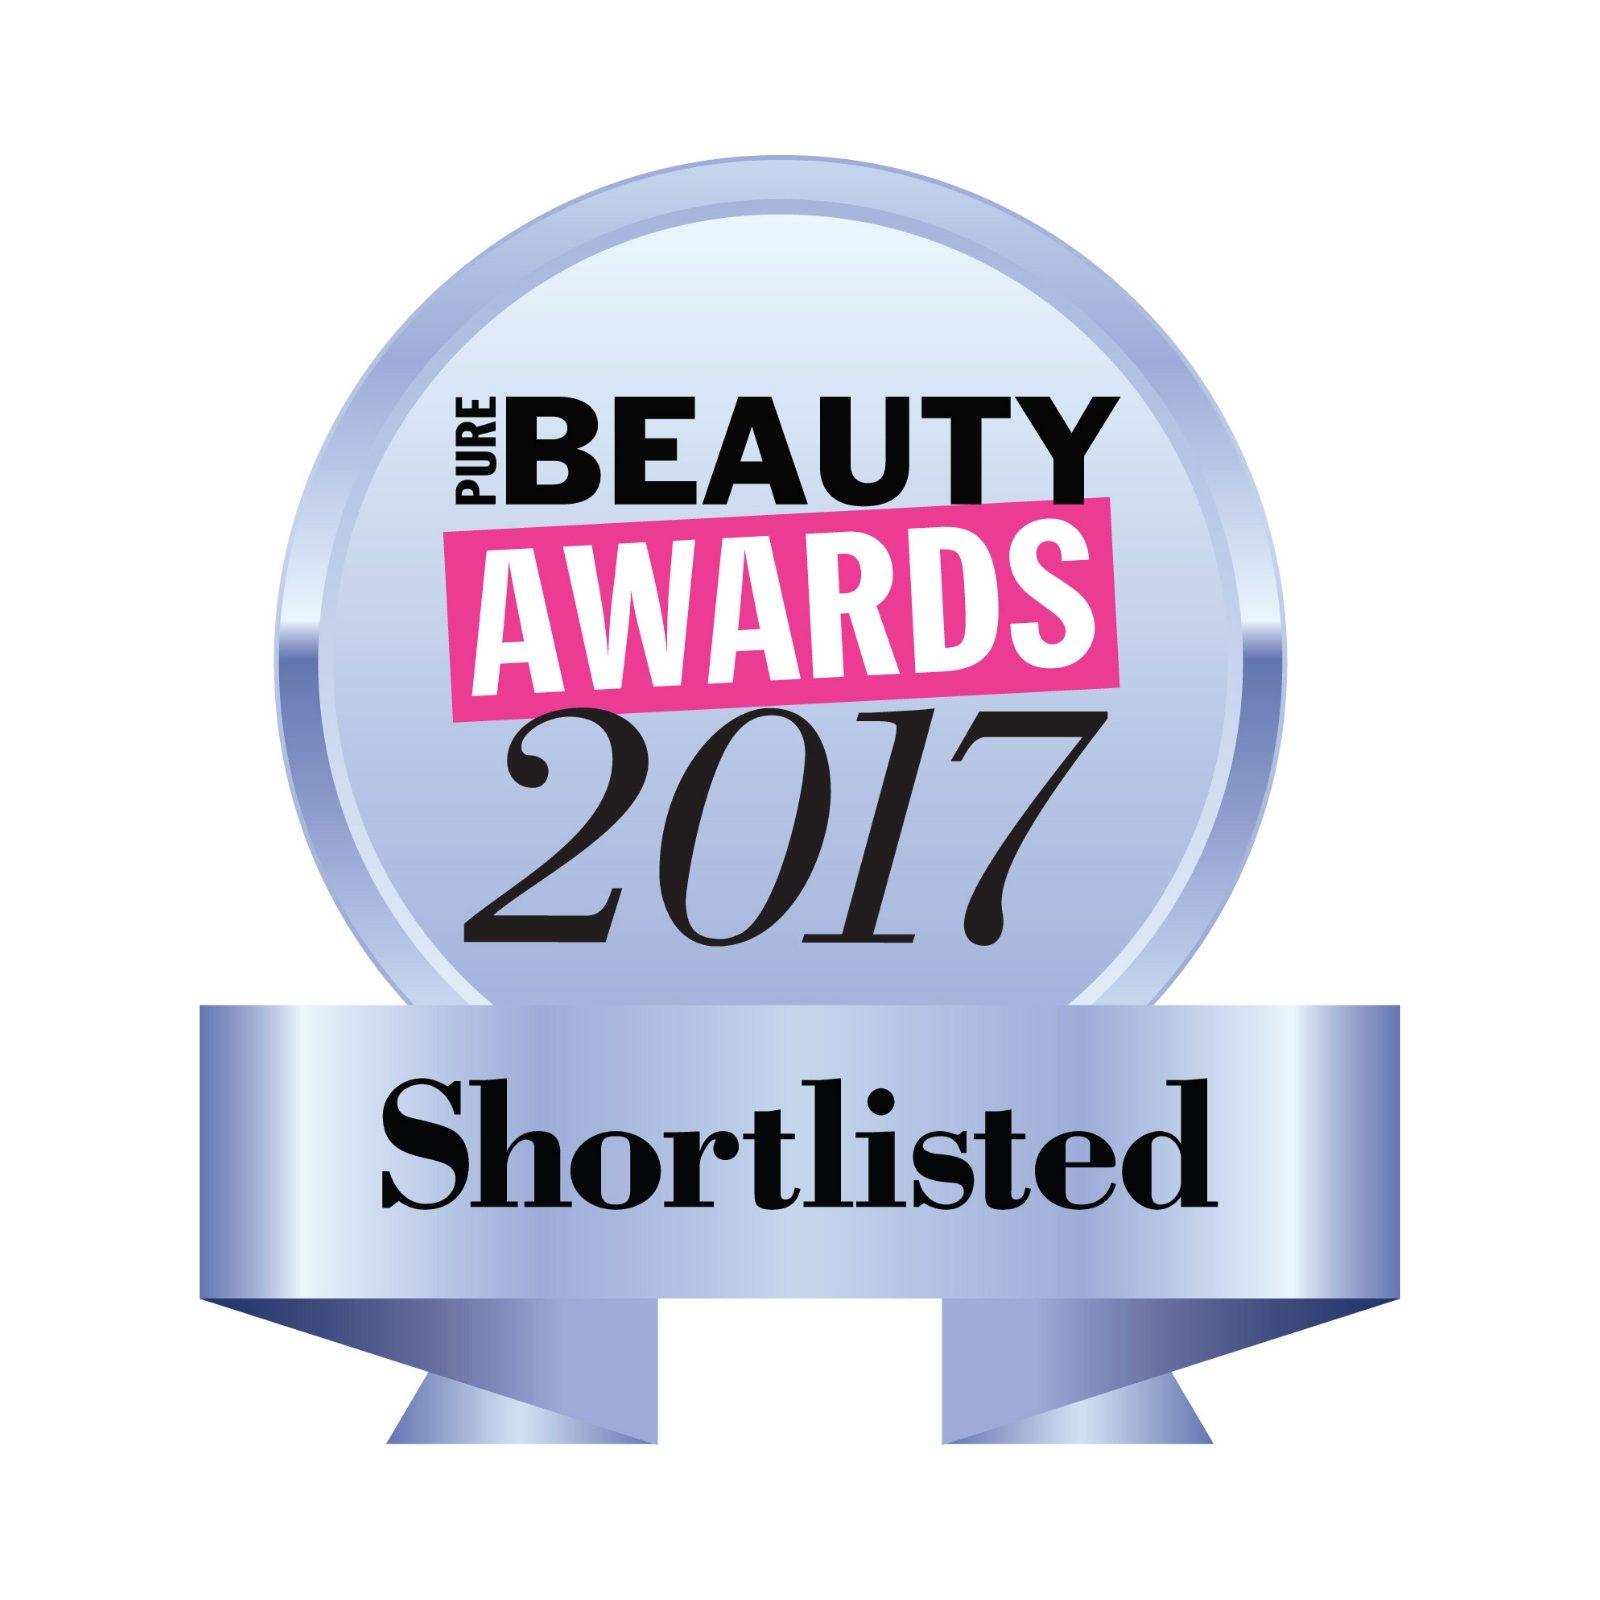 pure beauty award shortlisted logo